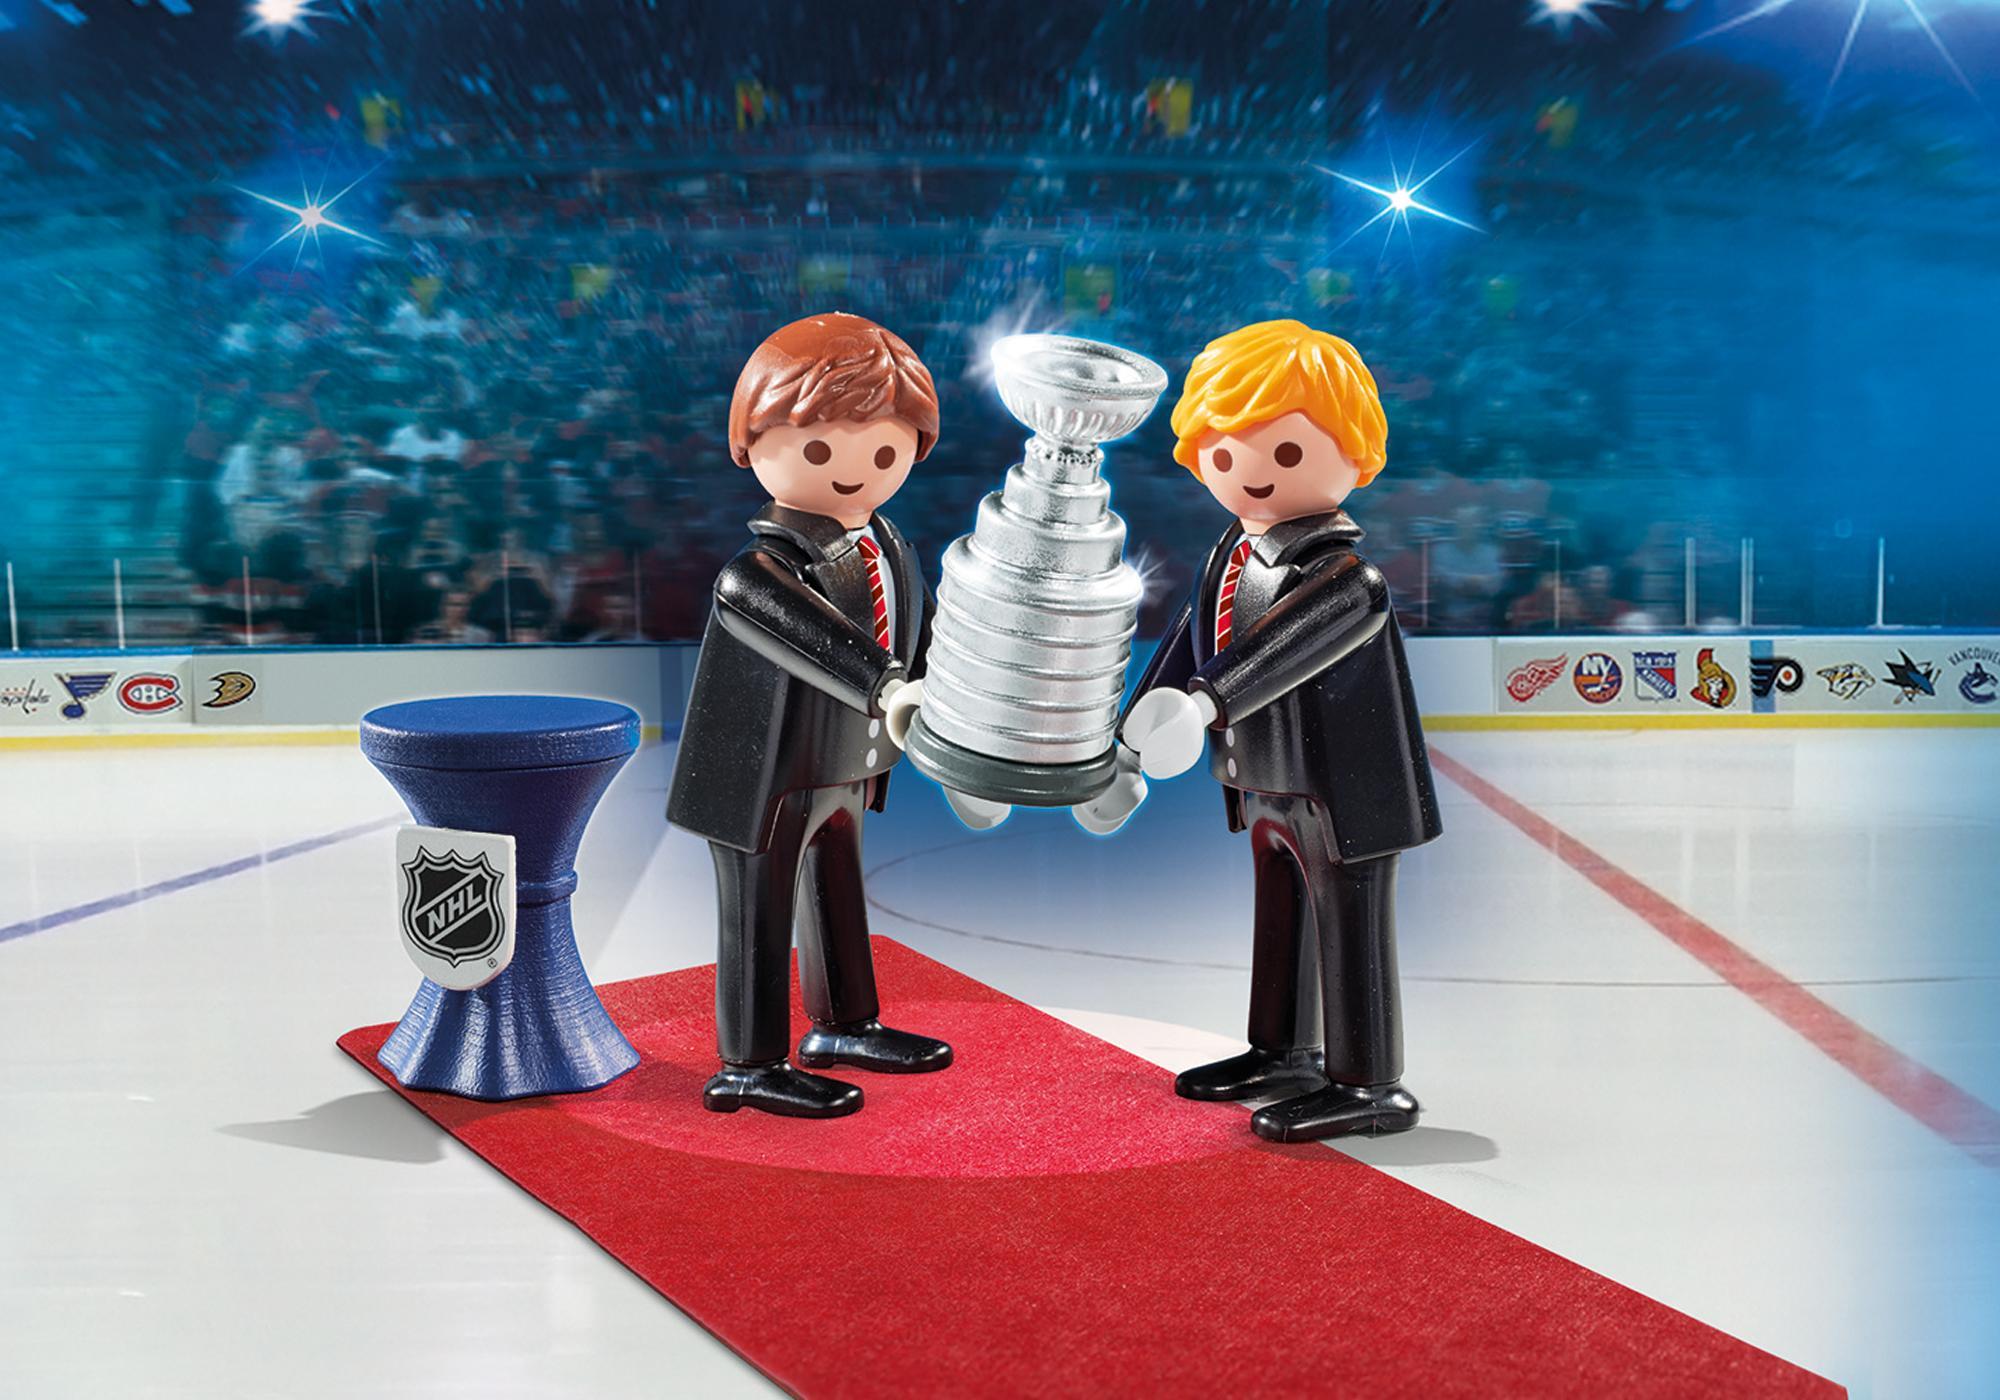 http://media.playmobil.com/i/playmobil/9015_product_detail/NHL™ Stanley Cup™ presentation set